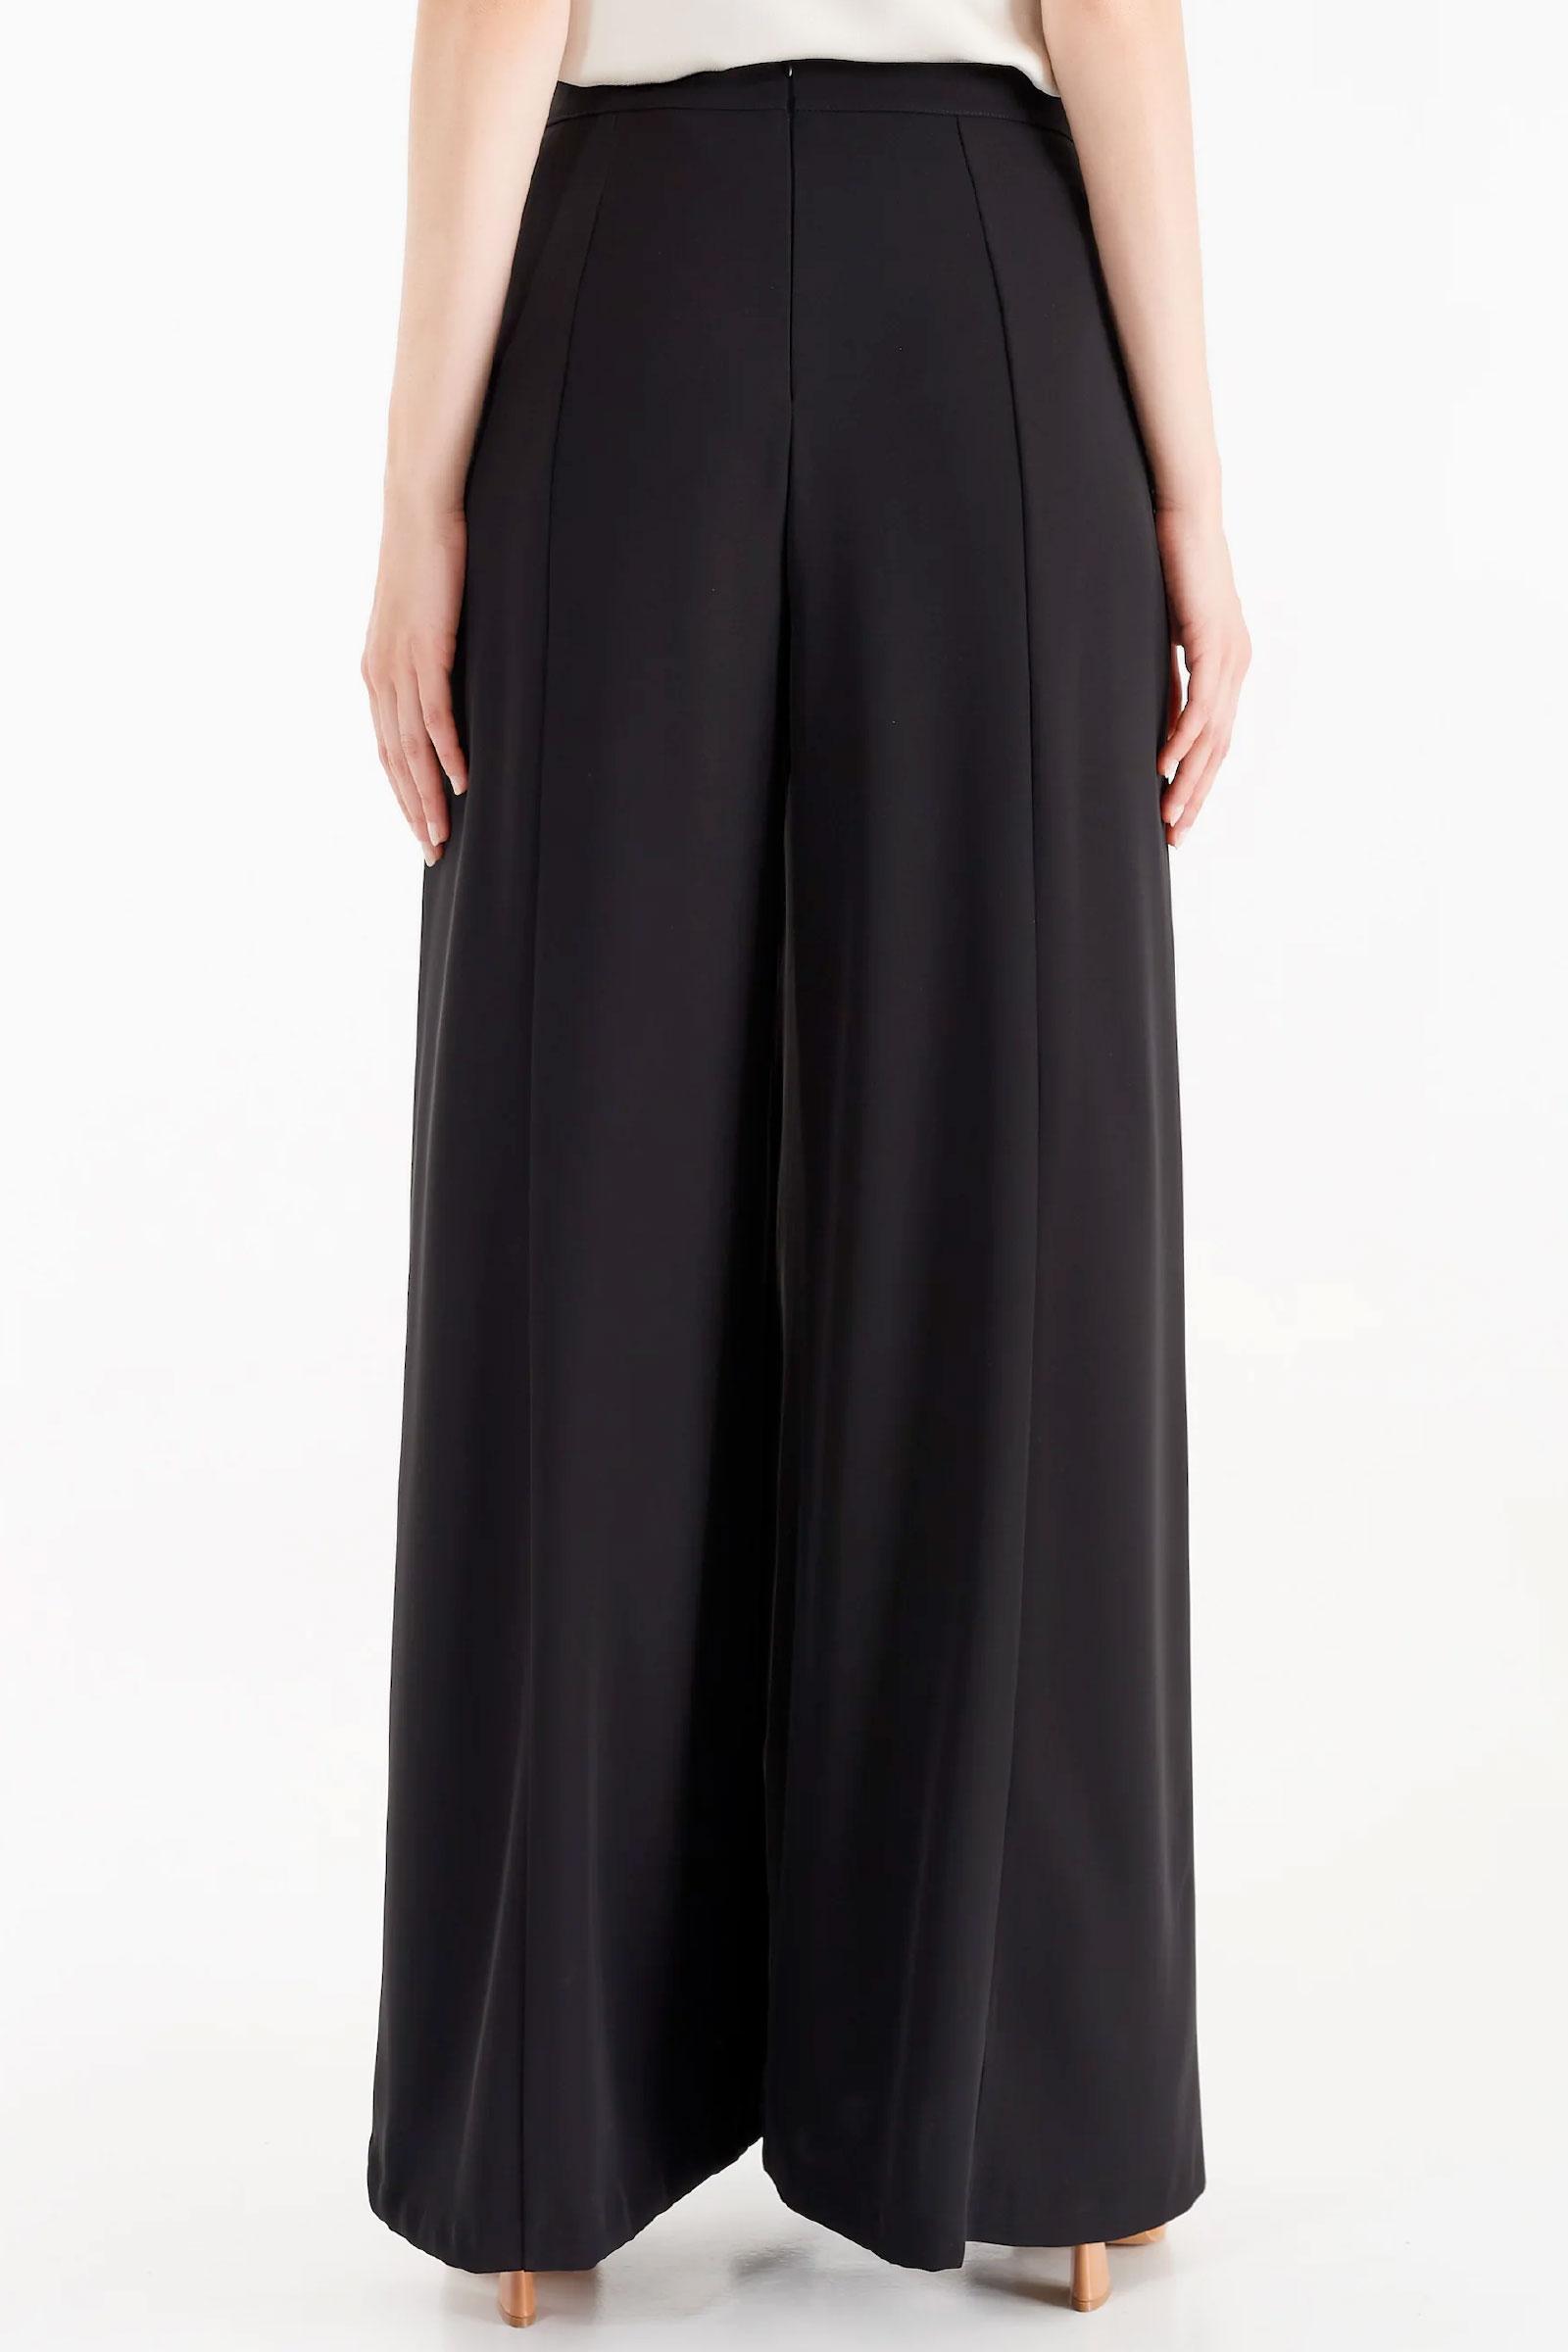 RINASCIMENTO   Trousers   CFC0104852003B001